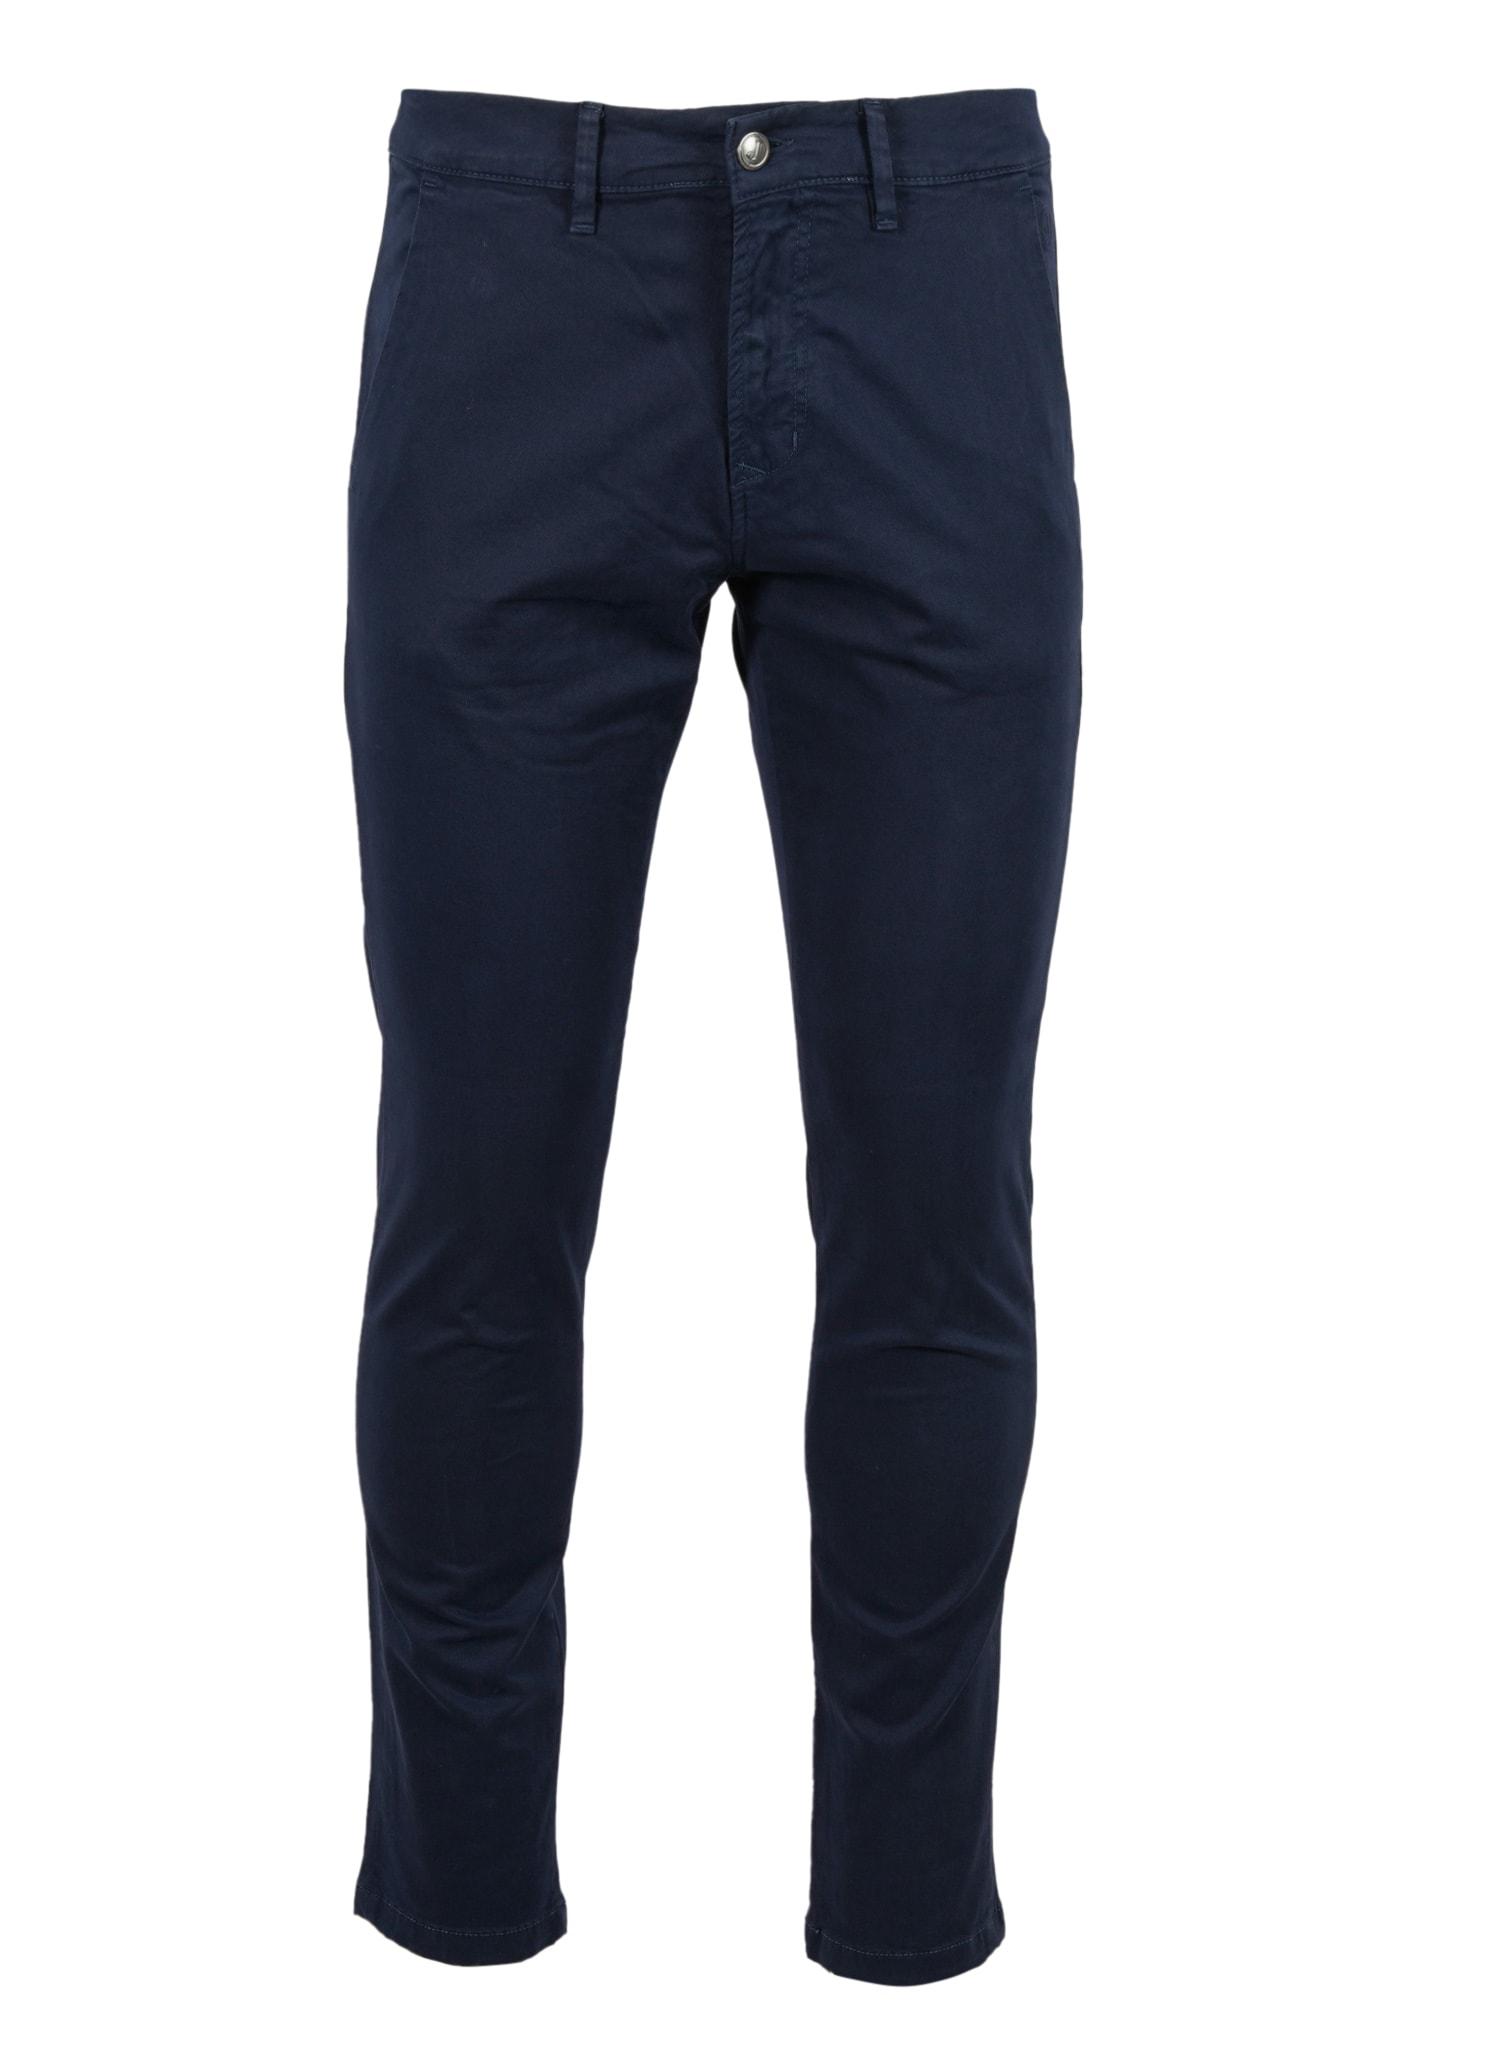 Pantal. Uomo Slim Trousers